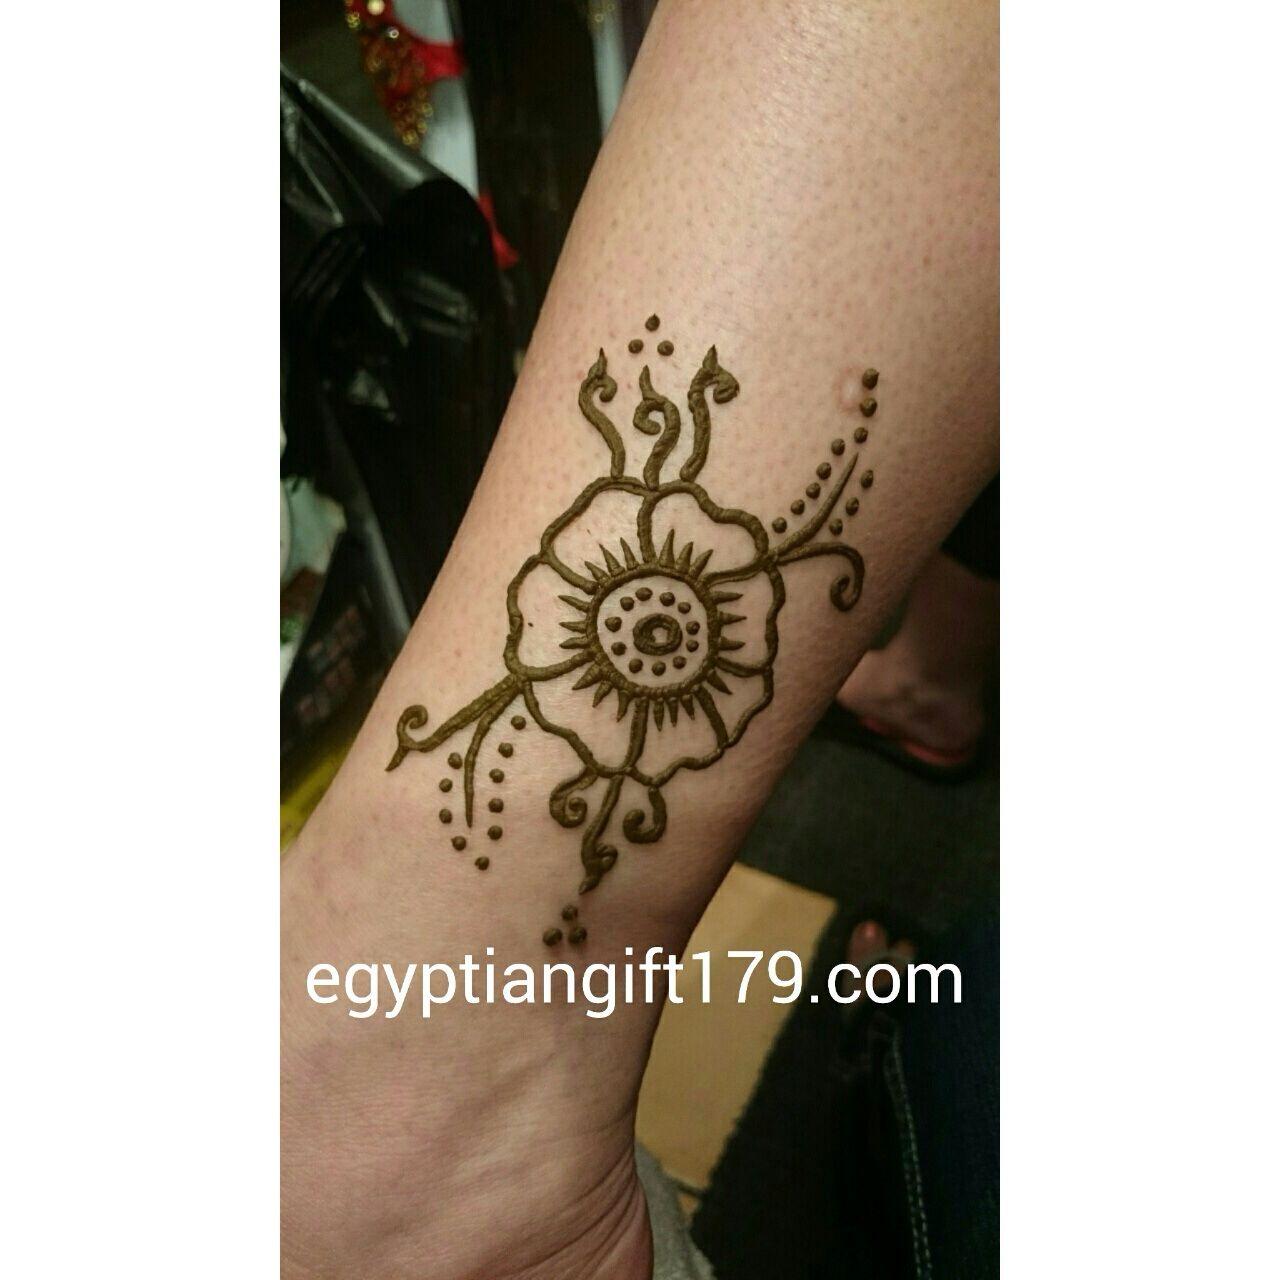 Egyptian Gift Corner Henna shop, Henna kit, Tattoos